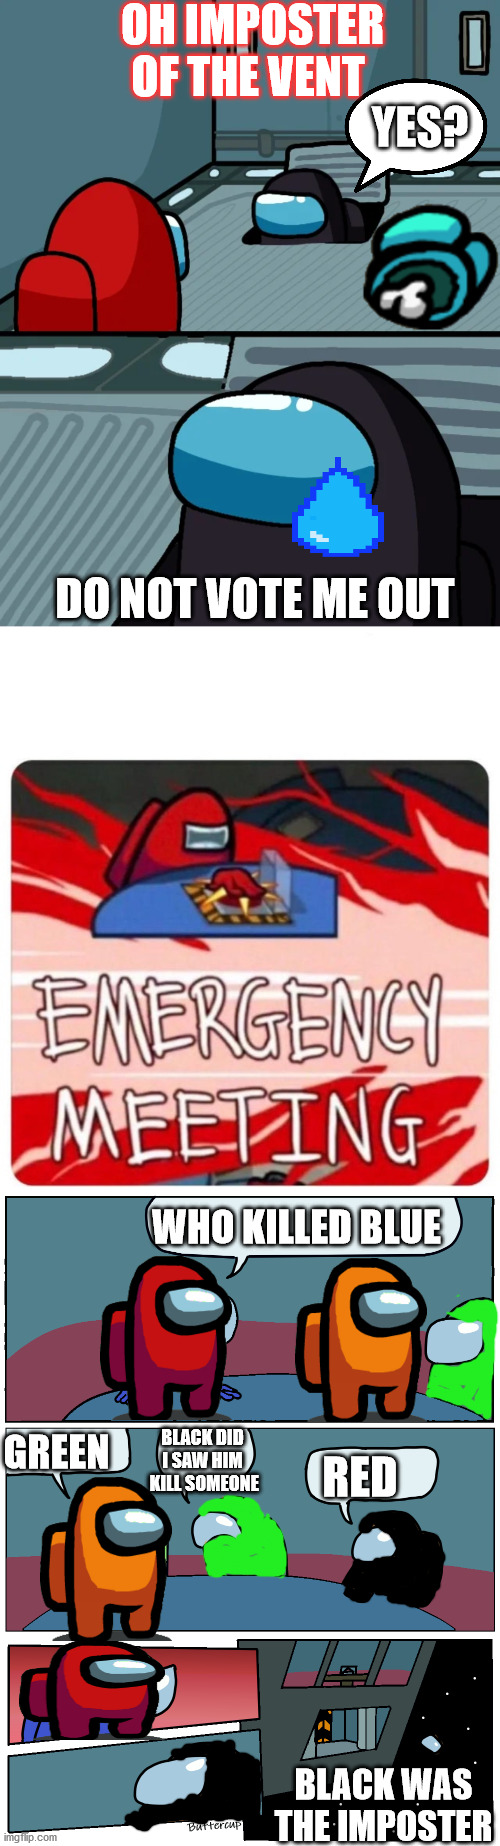 Gaming Emergency Meeting Among Us Memes Gifs Imgflip